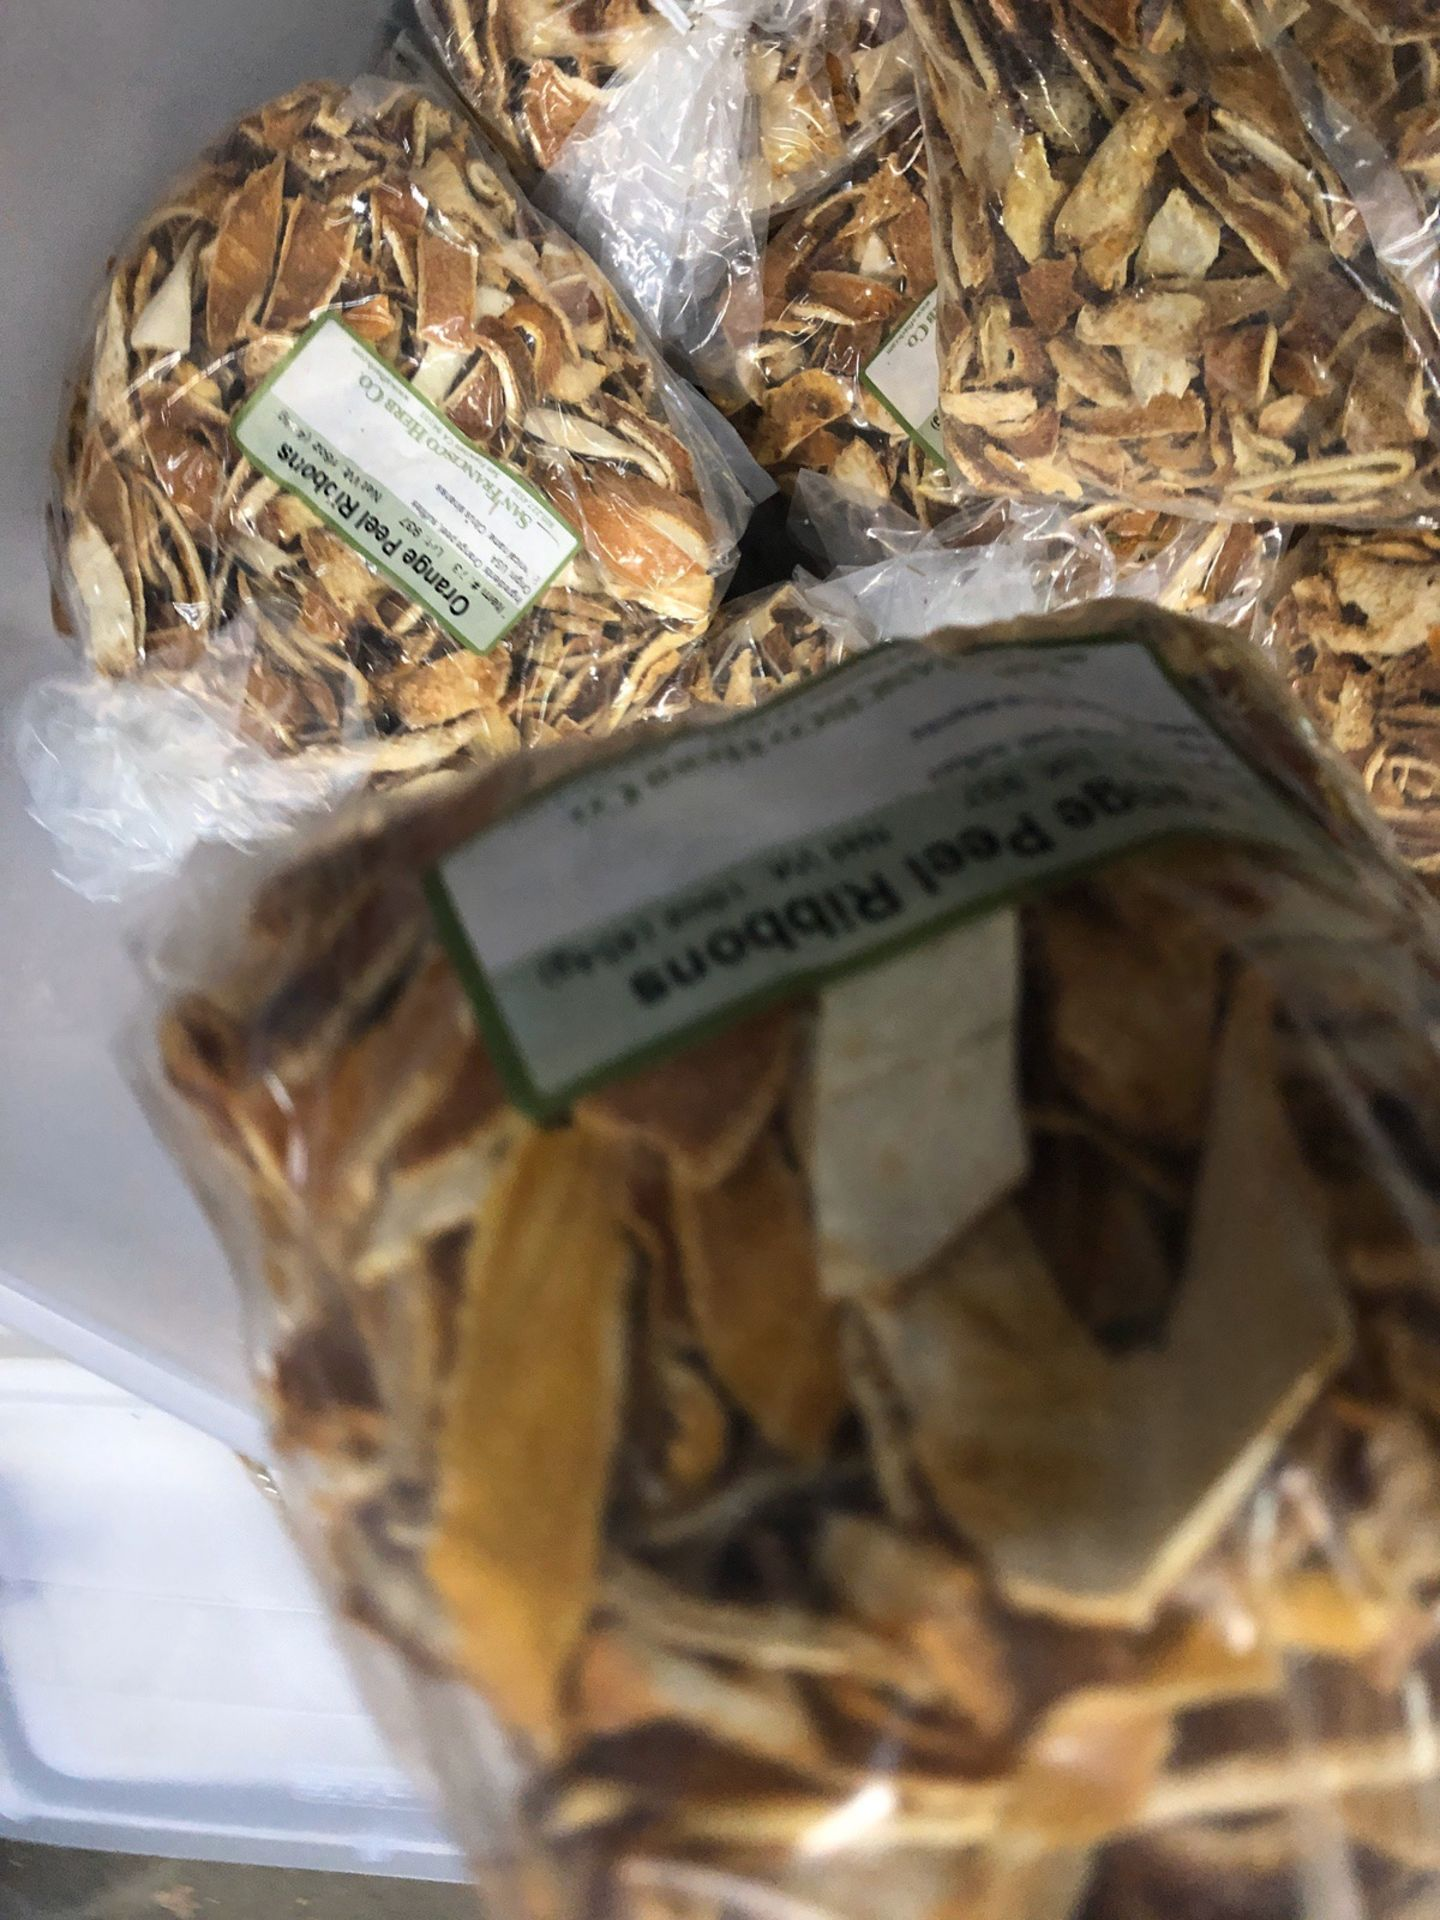 Lot 105 - Lot of Herbs and Botanicals: Lemon Peel, Orange Peel | Rig Fee: $20 or HC